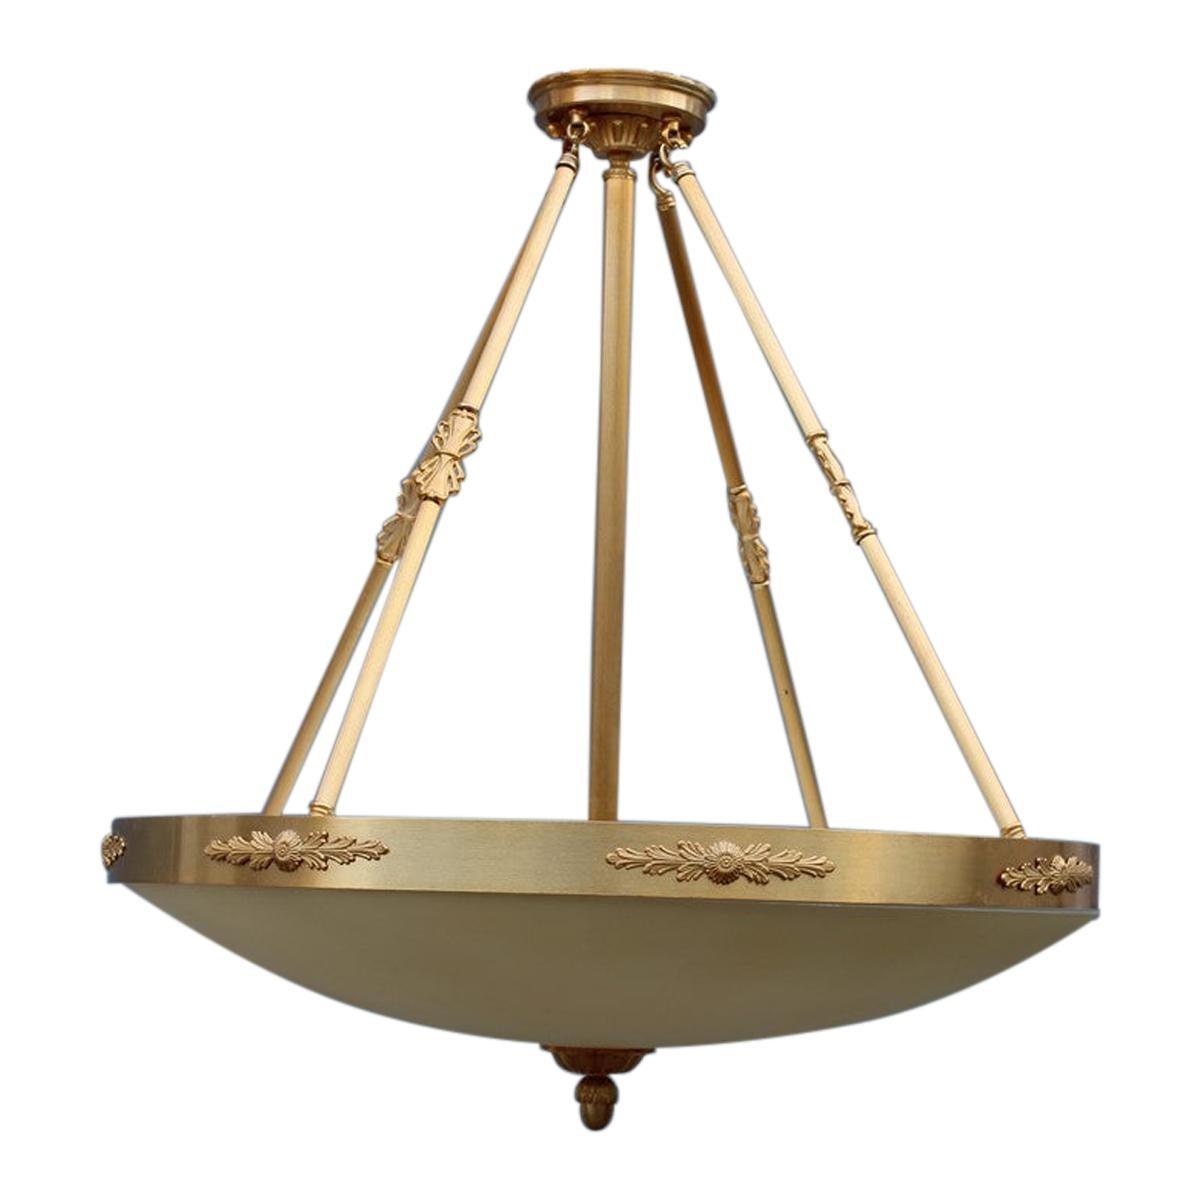 Big Classic Round Italian Chandelier Brass Gold Yellow Glass Italian Design 1970